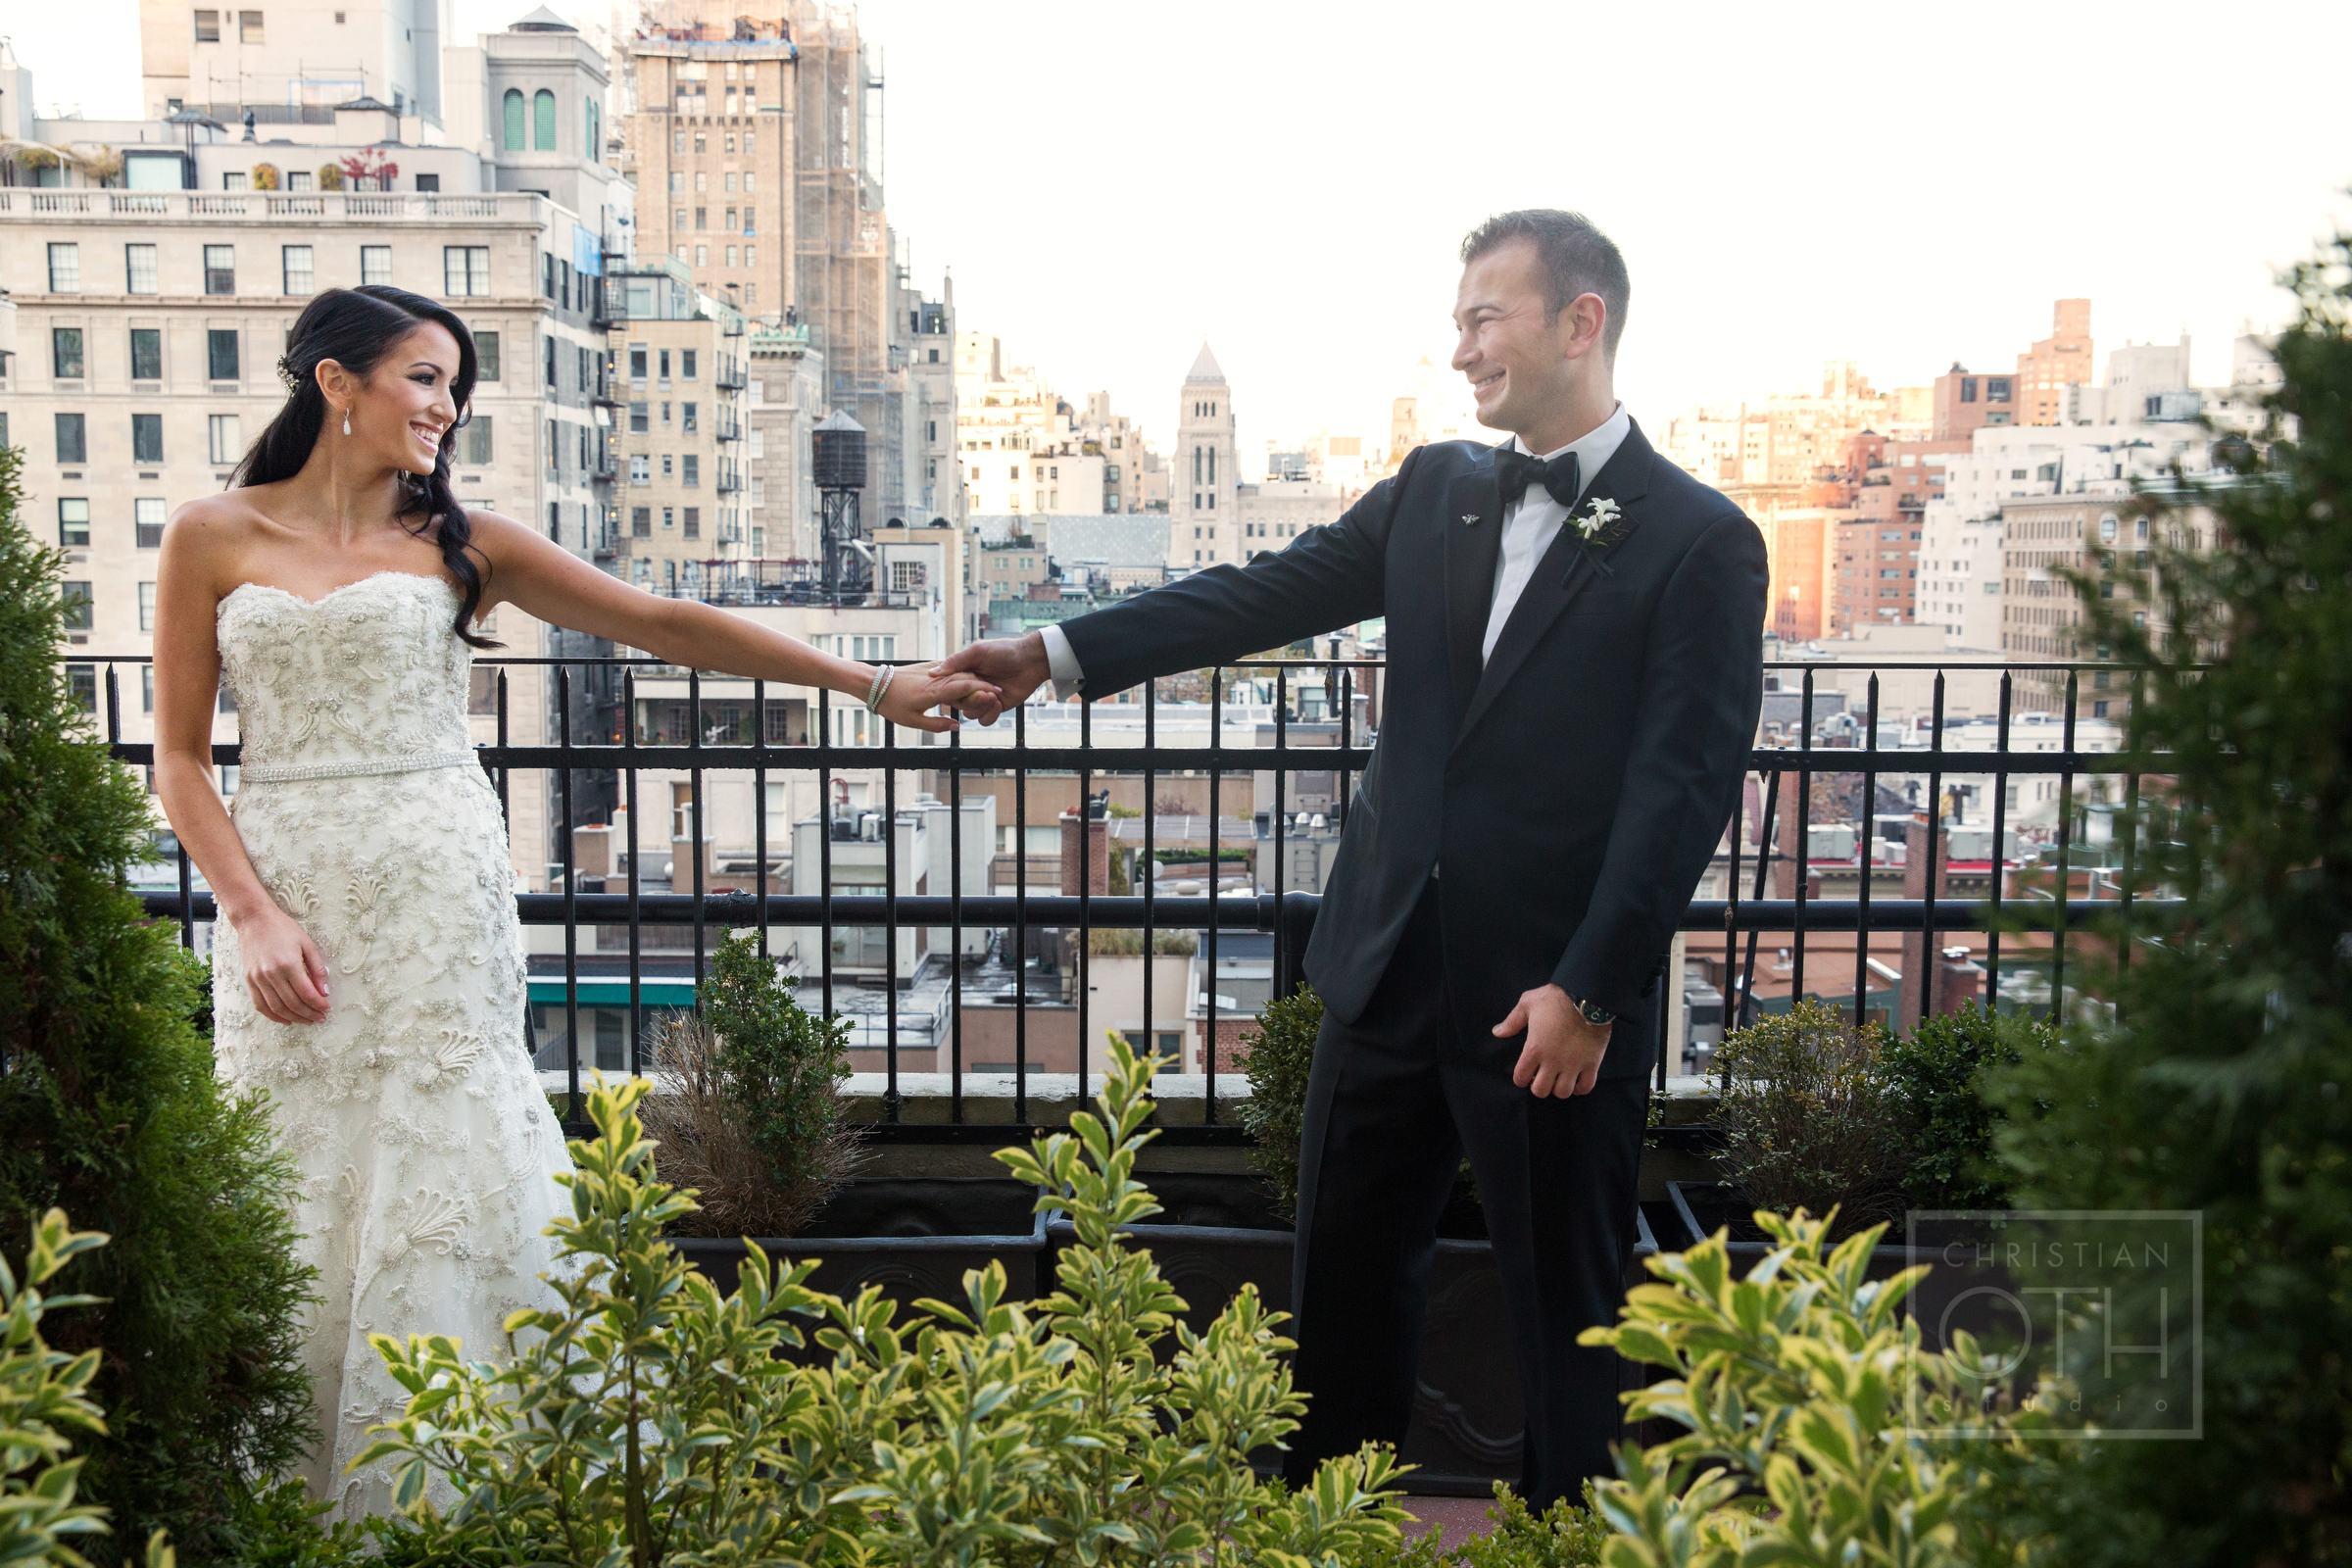 Ceci_New_York_Custom_Invitation_Pierre__City_ Destination_Wedding_Luxury_Personalized_Ceci_Style_Bride_Rose_Gold_Foil_Stamping47.JPG